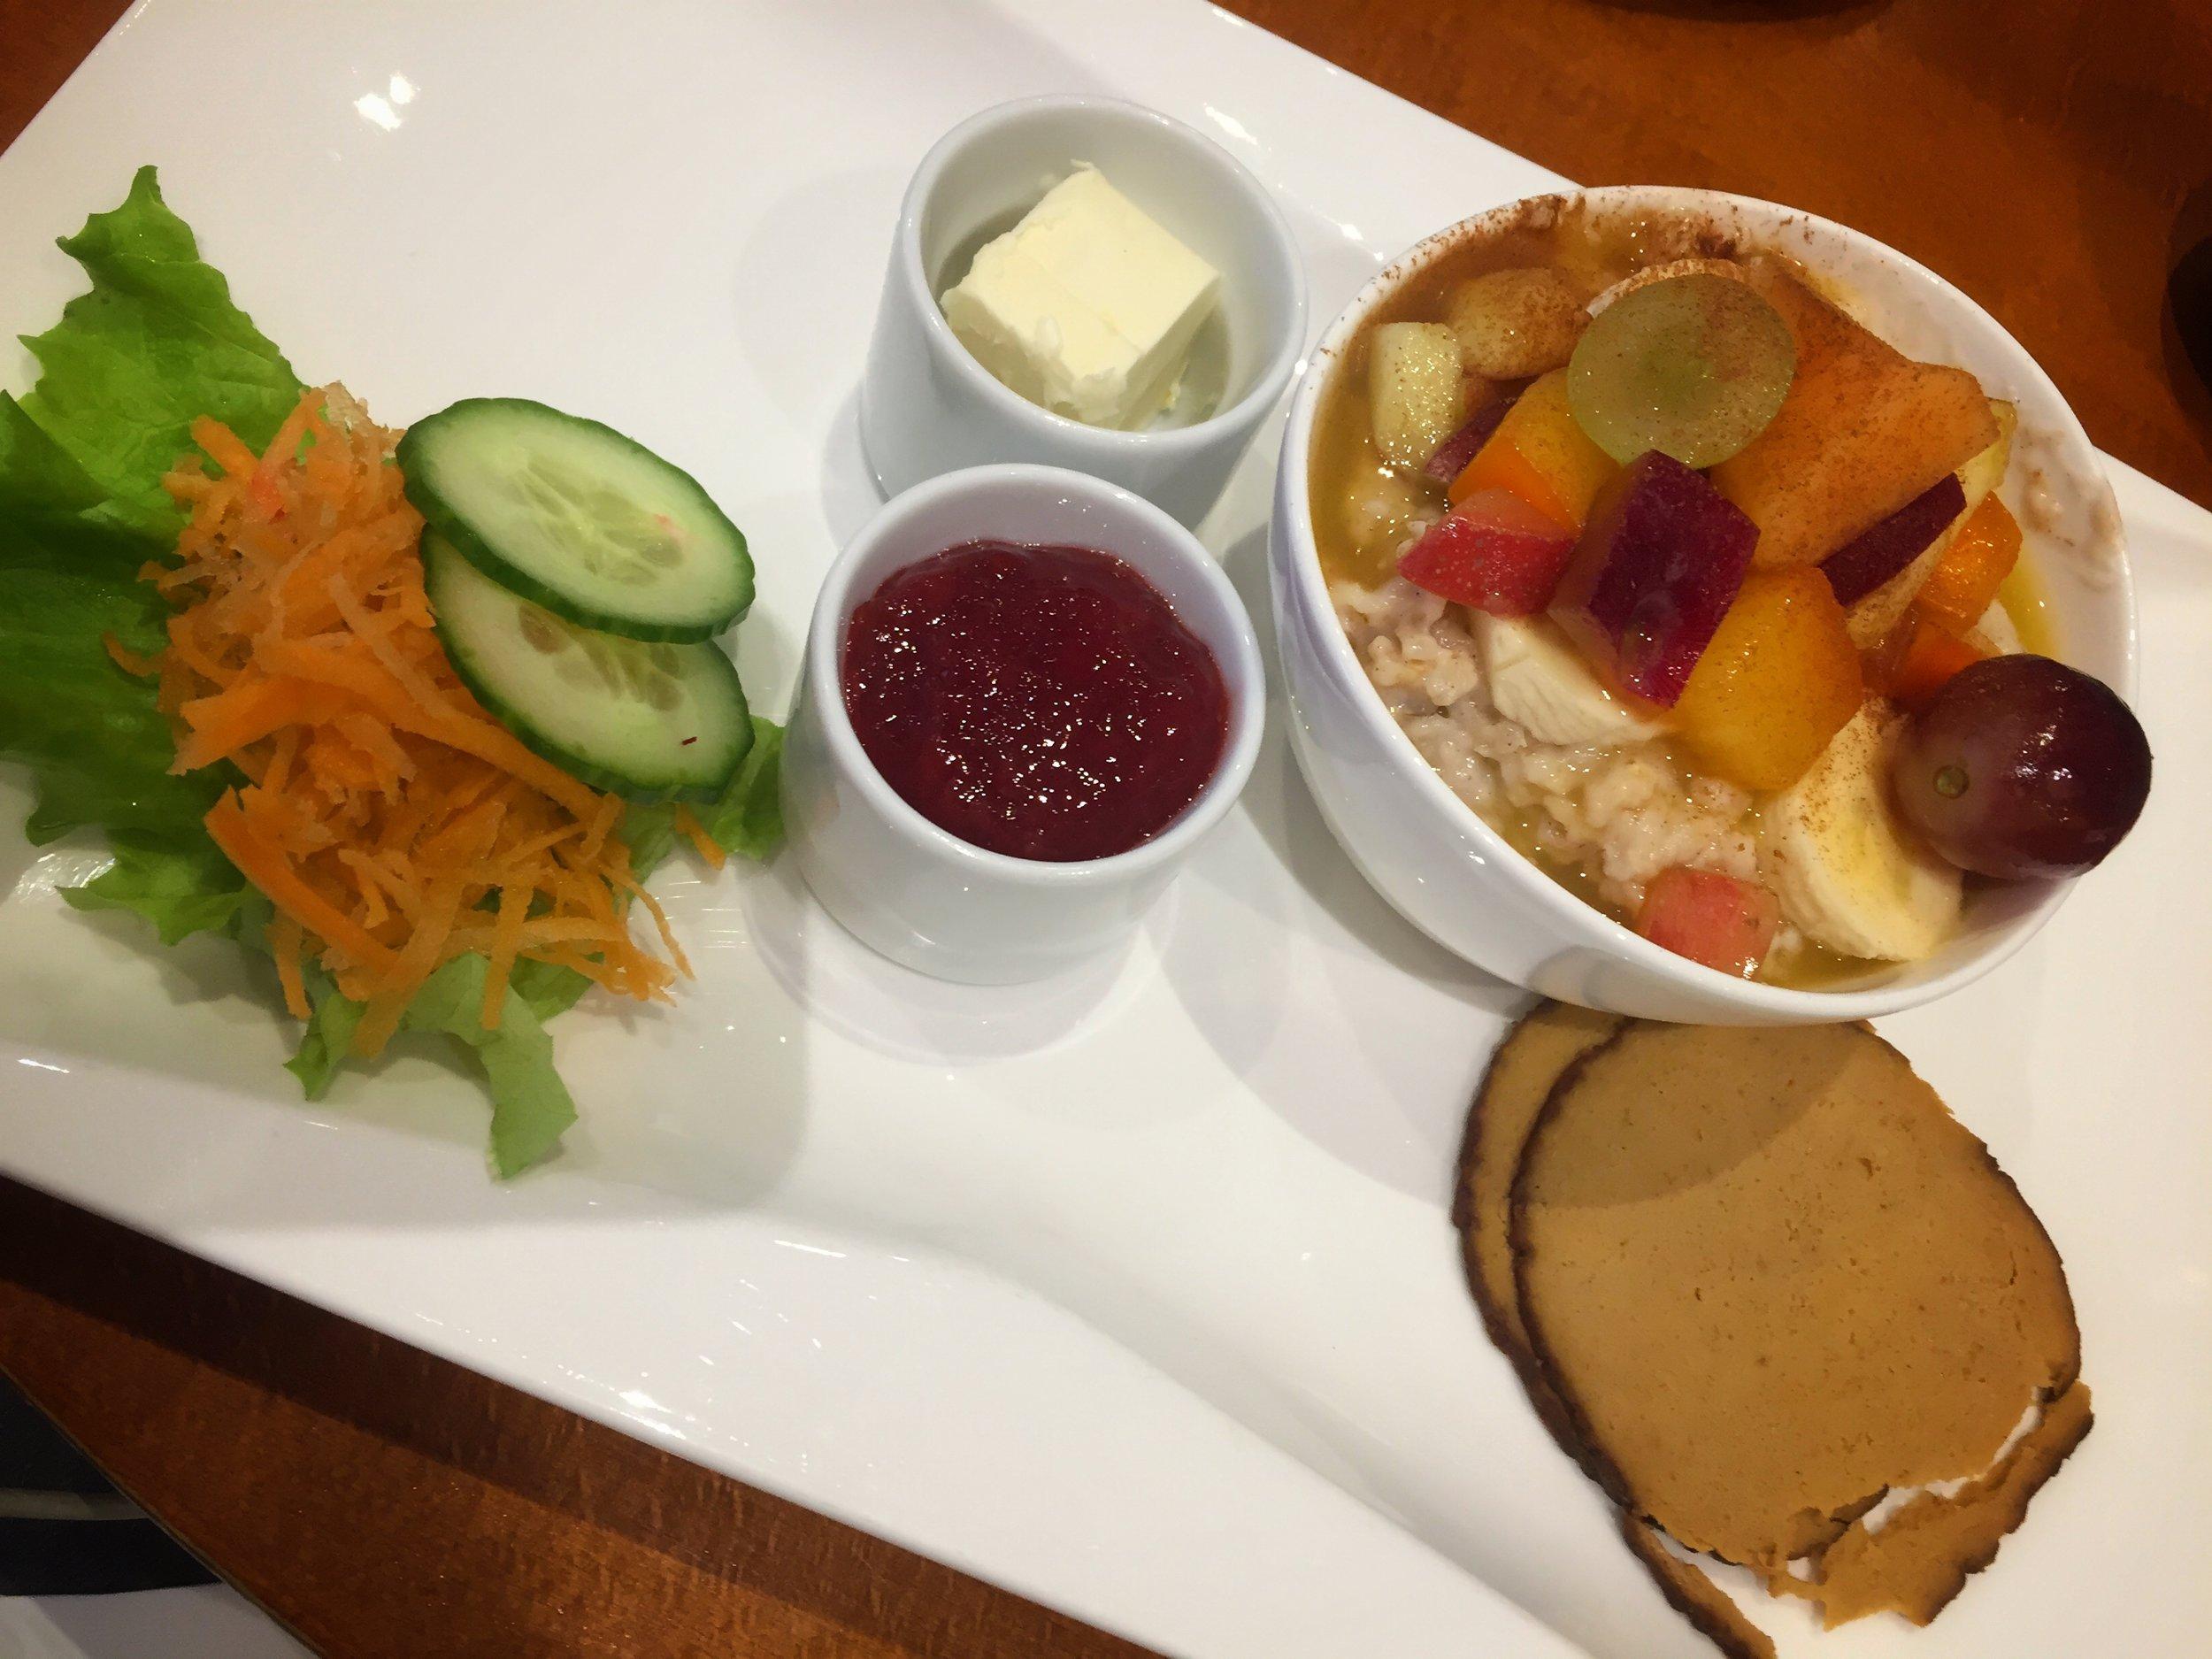 vegan oatmeal & protein slice at The Heart of Joy Café (Salzburg)